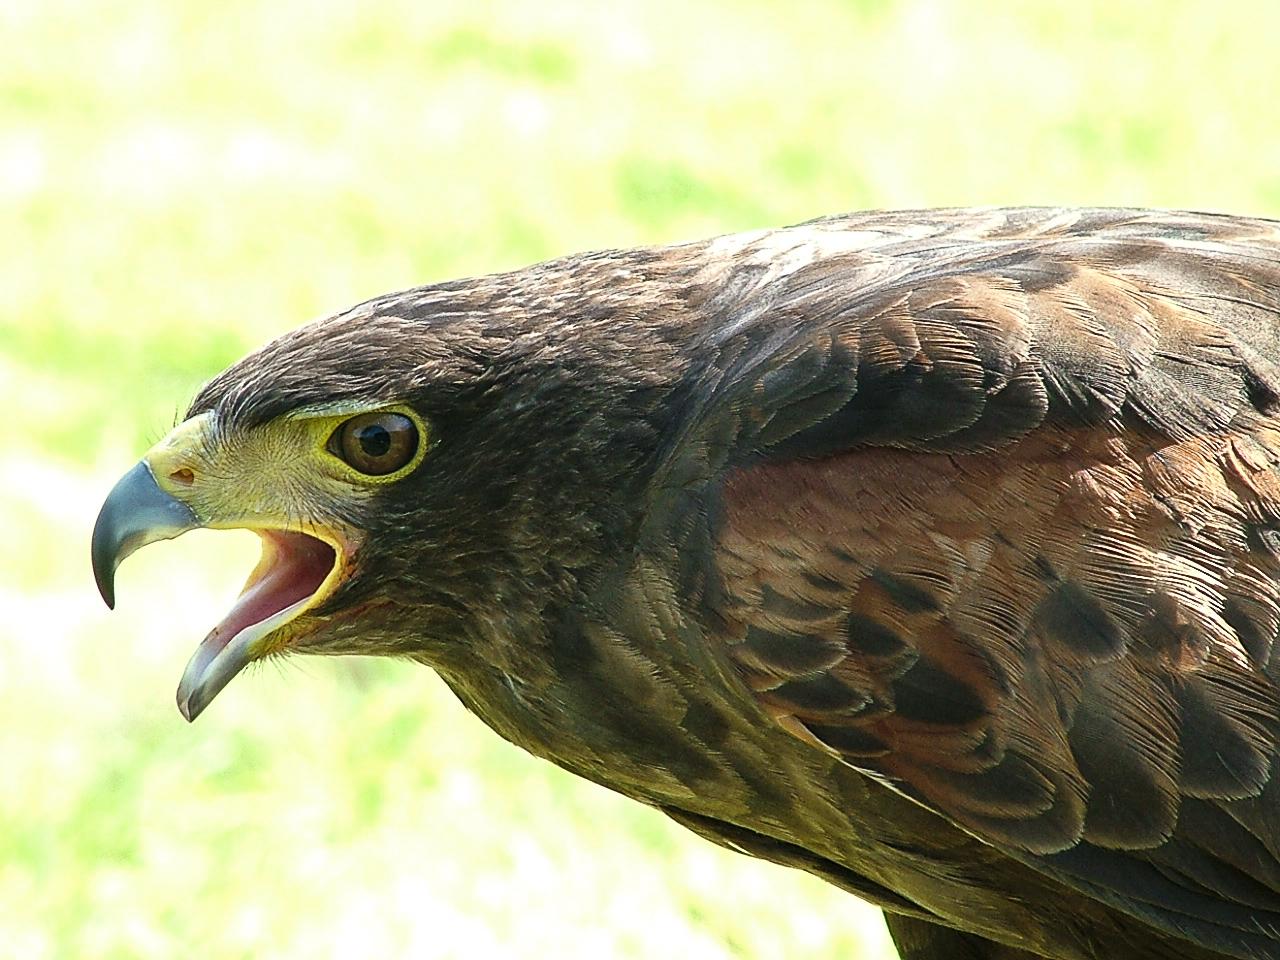 Harris hawk at Inspired Falconry